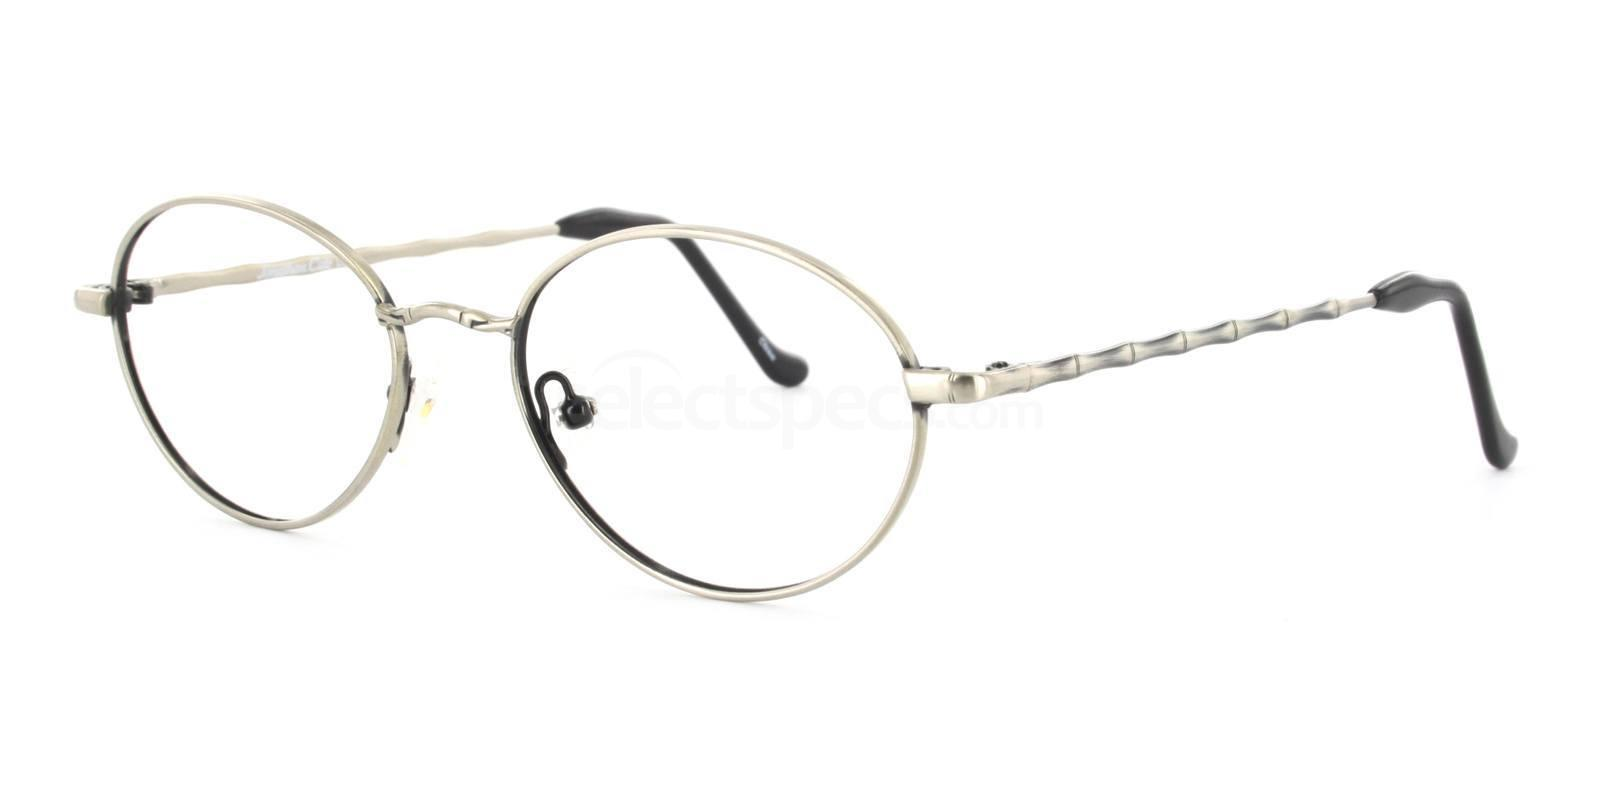 Antares 615 glasses